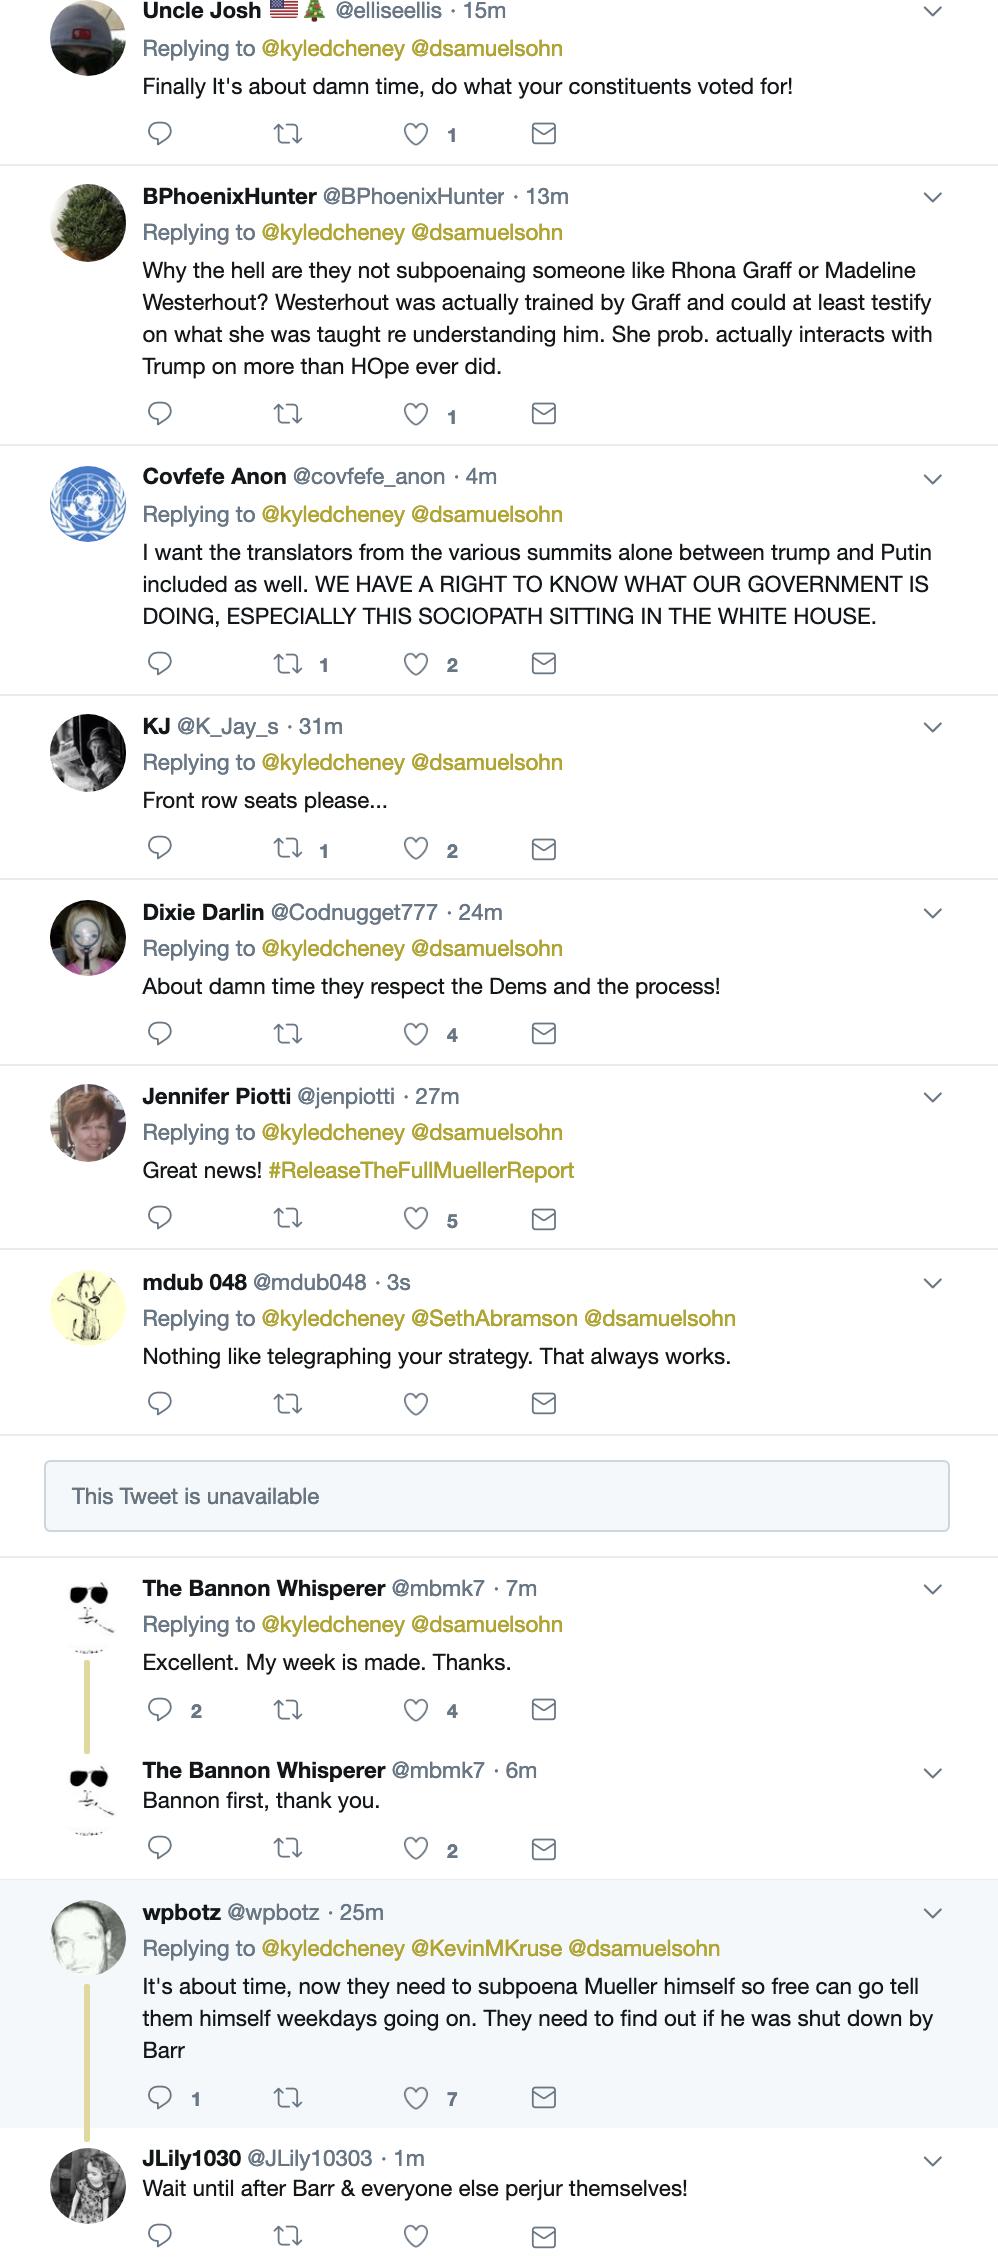 Screen-Shot-2019-04-01-at-8.04.28-AM Judiciary Committee Drops Unedited Mueller Report Bombshell Corruption Crime Donald Trump Investigation Mueller Politics Robert Mueller Russia Top Stories